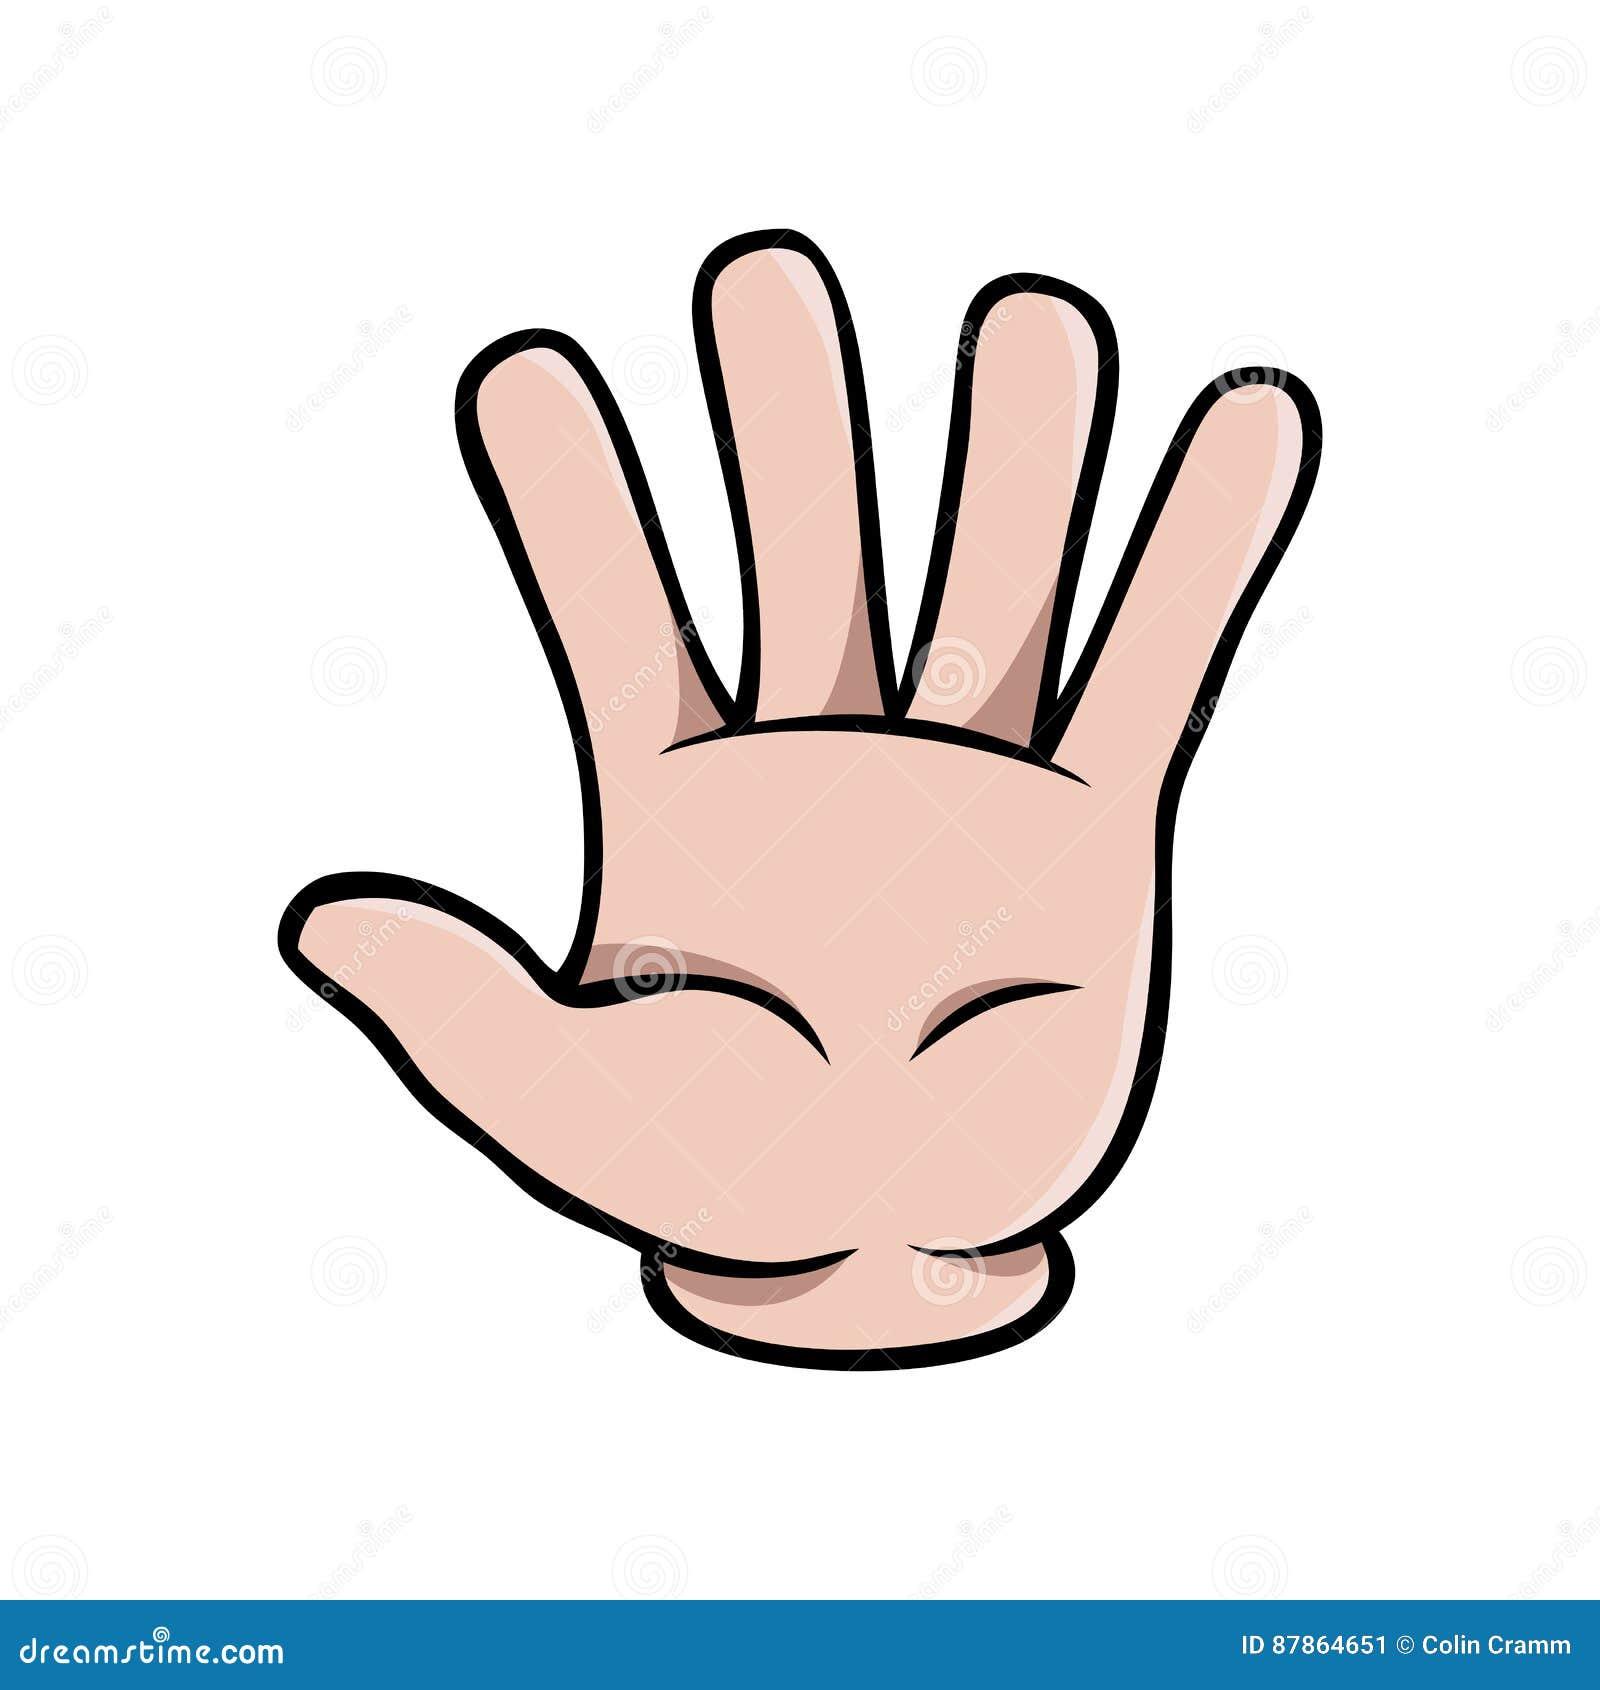 Cartoon Characters 3 Fingers : Human cartoon hand showing five fingers stock vector